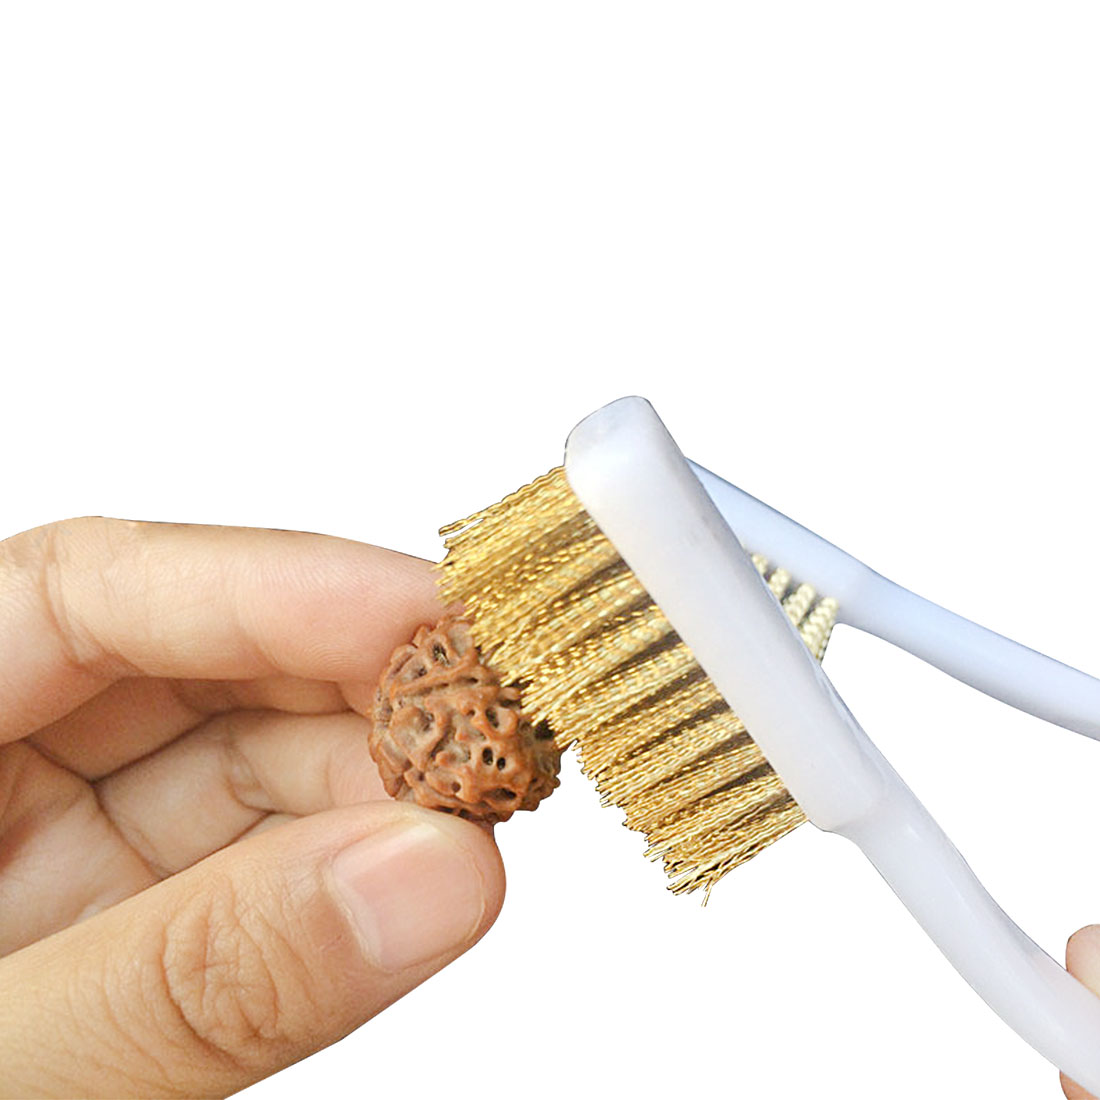 10pcs Handle Brass Bristle Wire Brush 6.9 Length Steel Nylon Cleaning Polishing Metal Rust